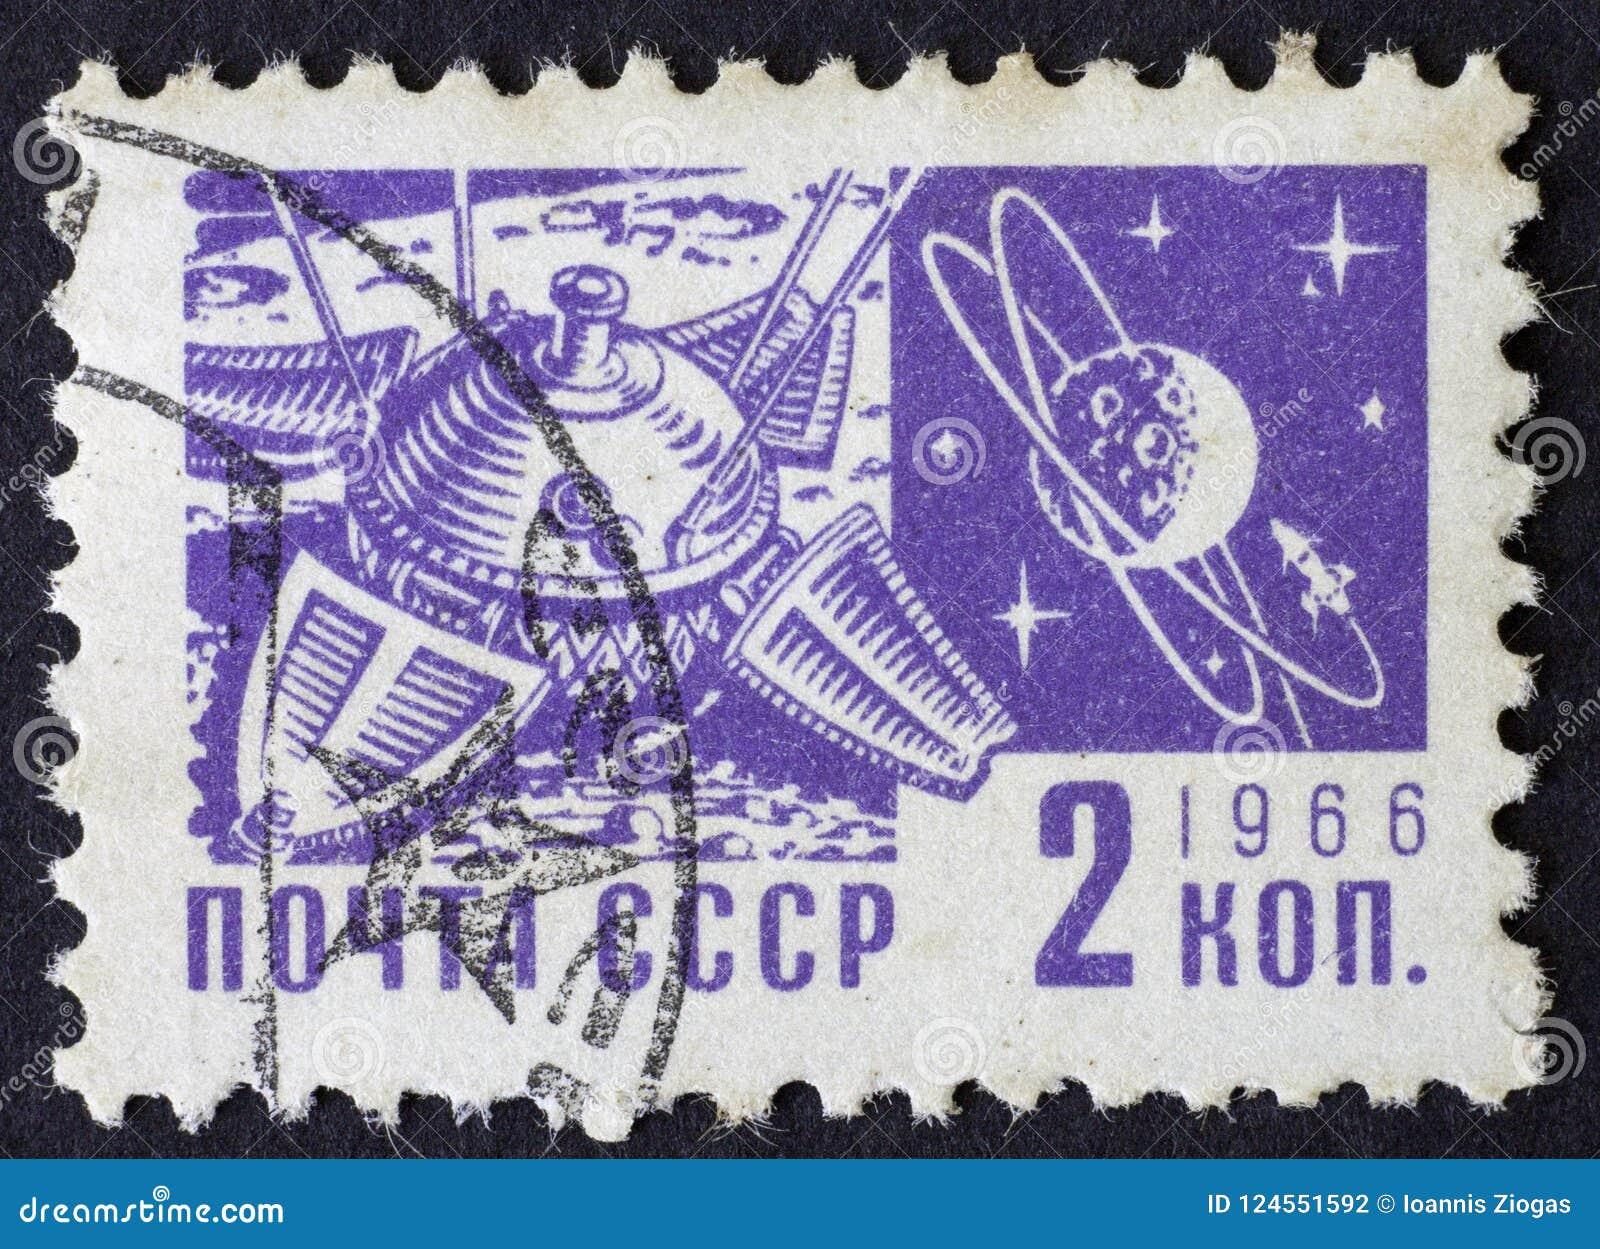 RUSSIA/USSR - CIRCA 1966: ruimte als thema gehade postzegel van 2 kopek, Moskou 1966